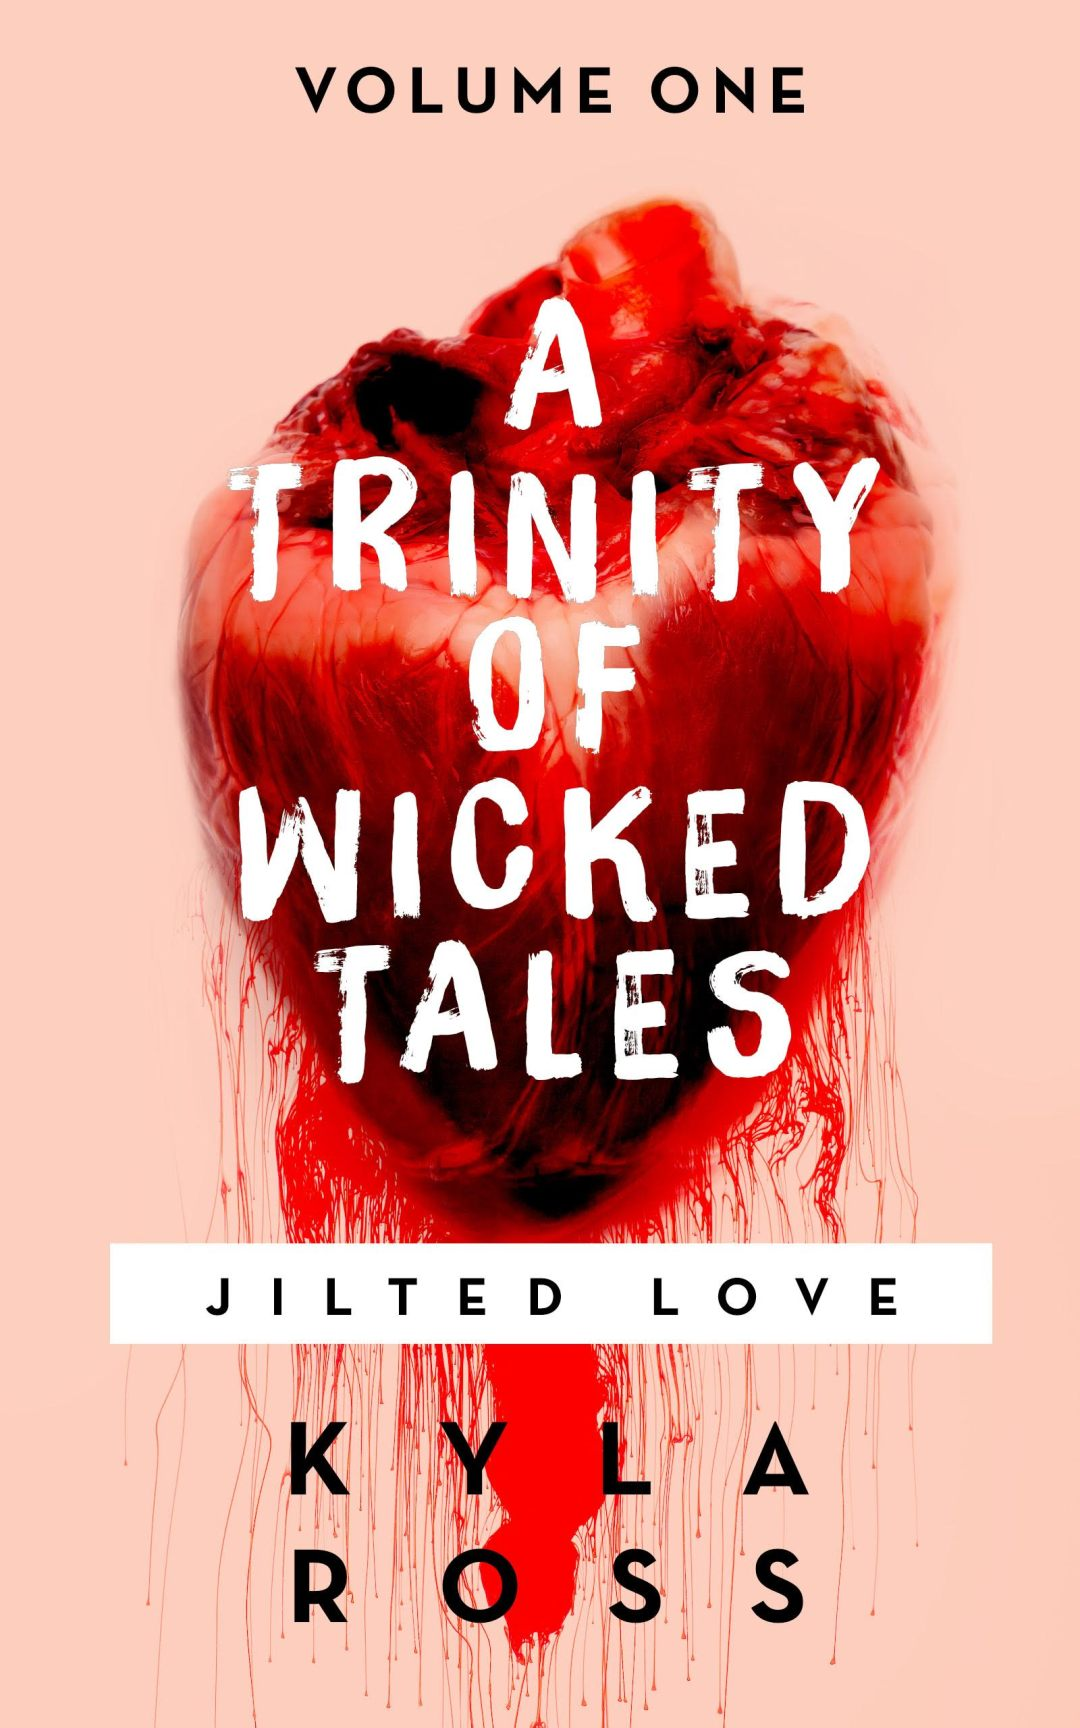 A Trinity of Wicked Tales: Jilted Love by Kyla Ross